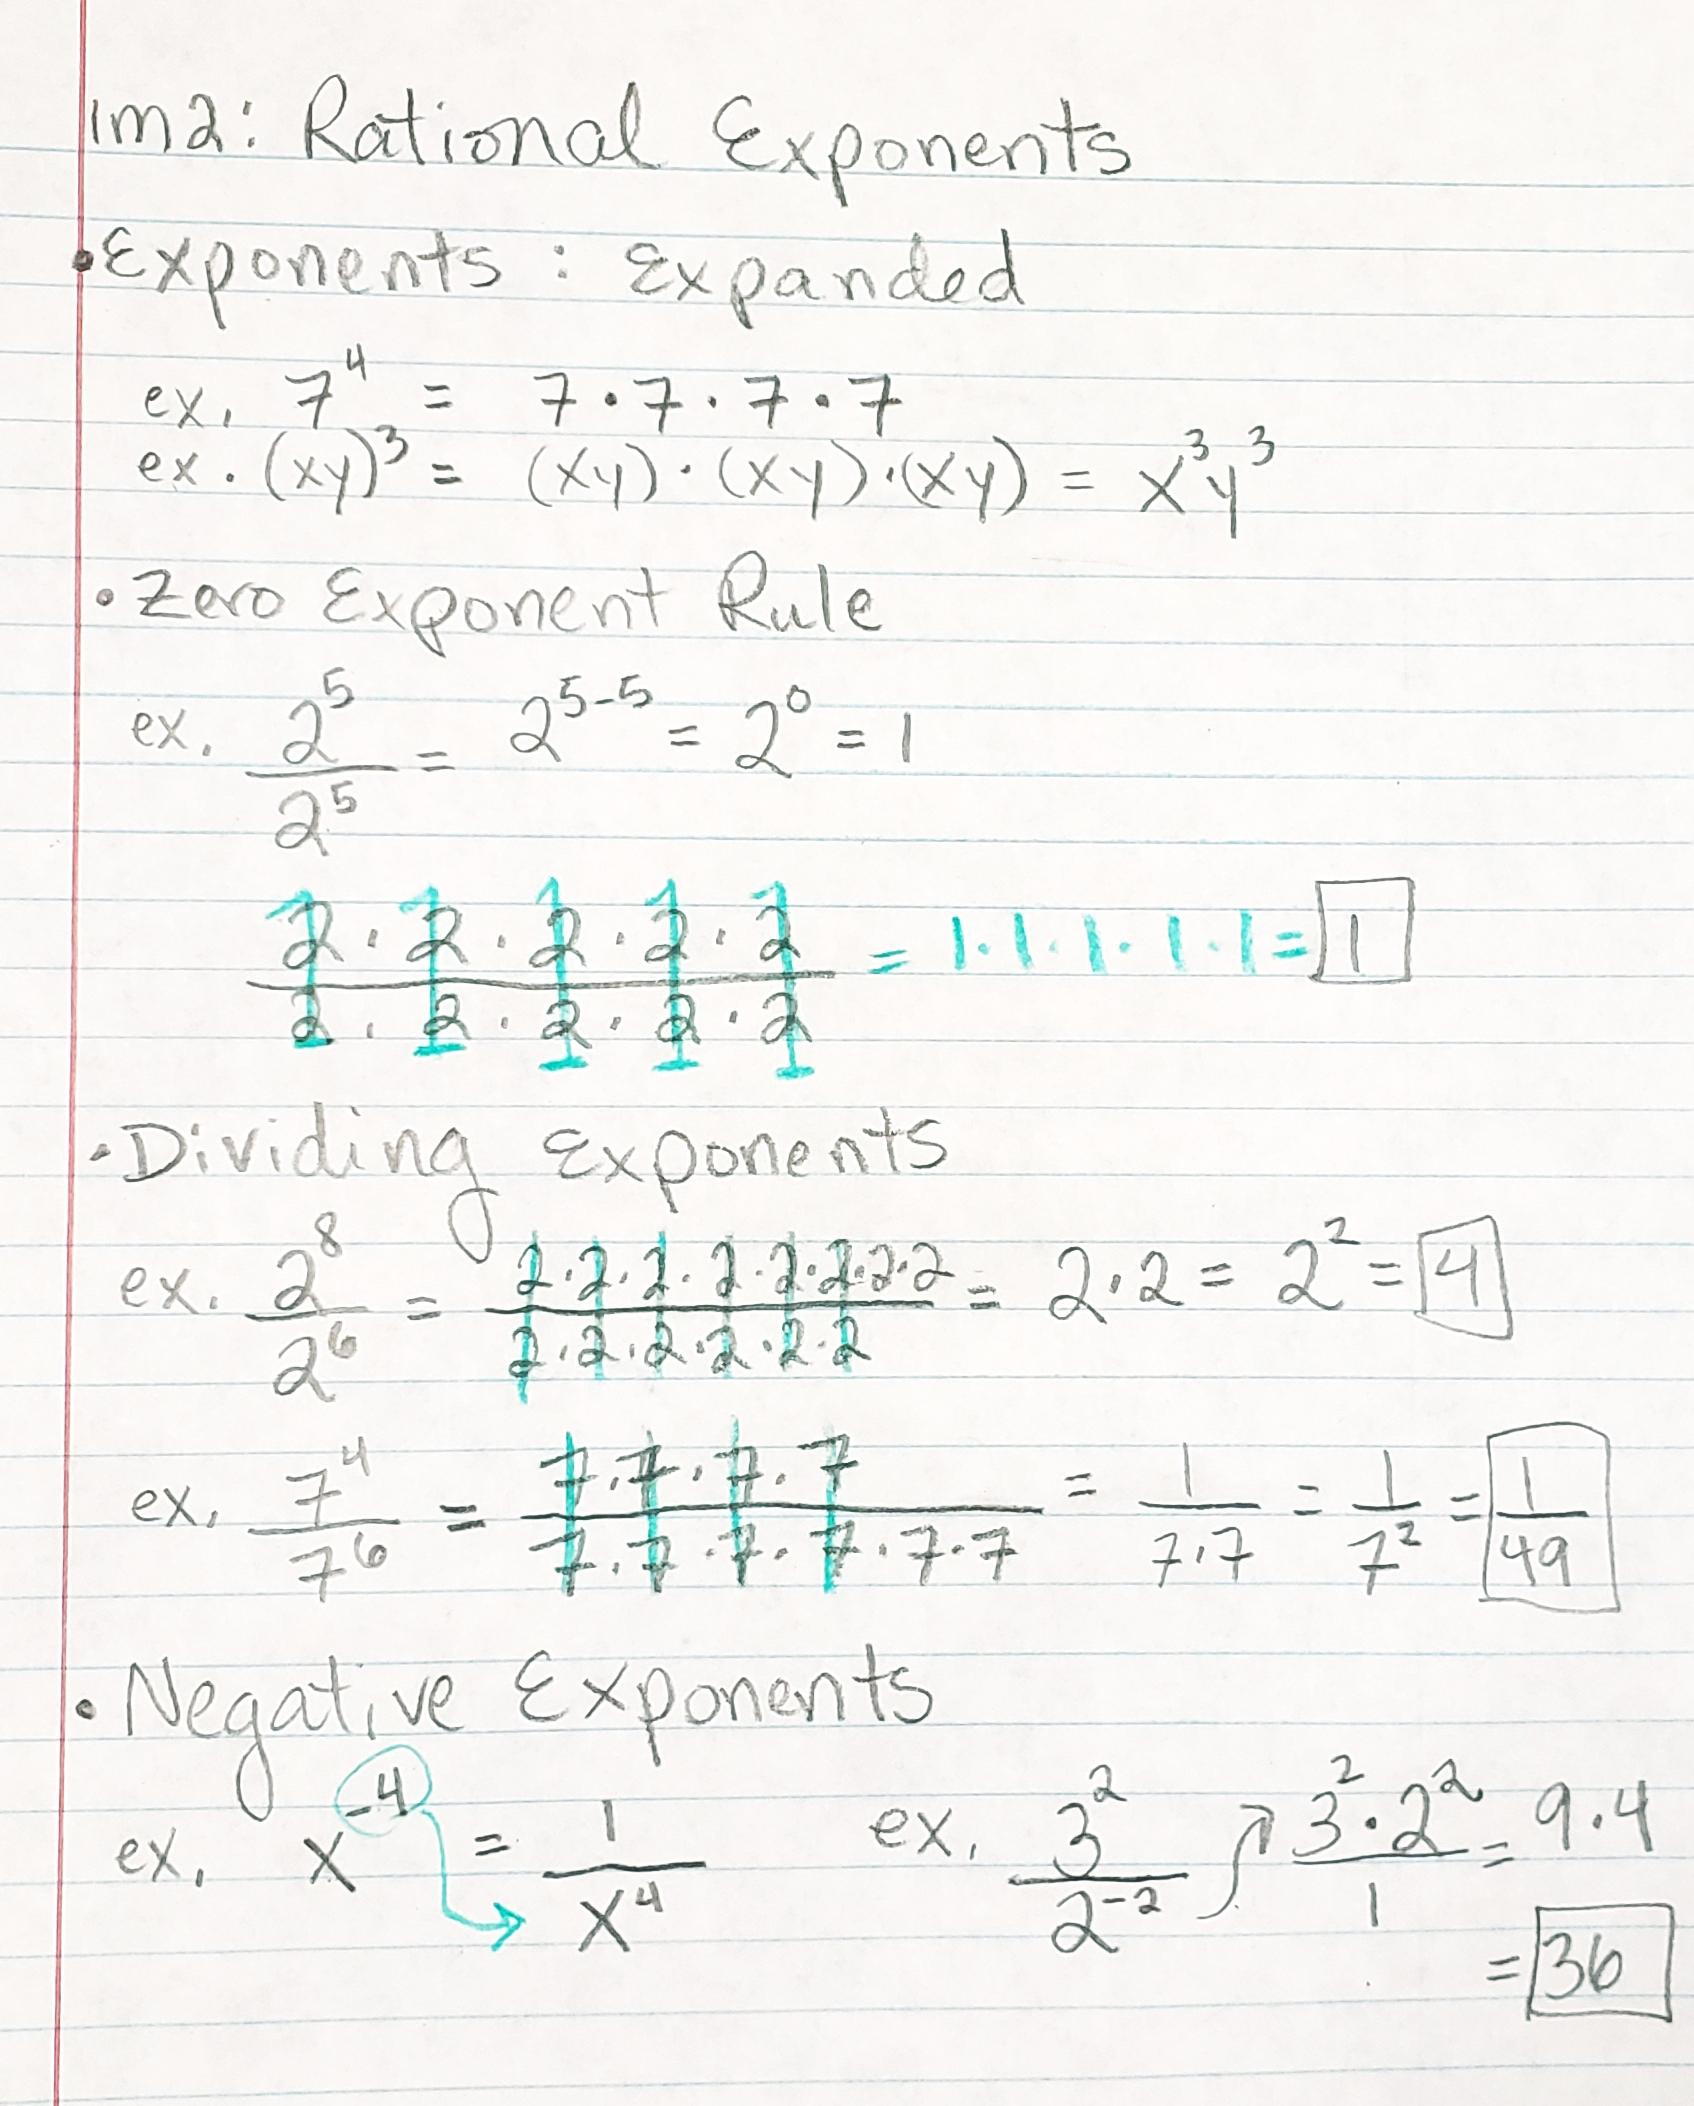 1 1 Explain Rational Exponents Amp Radicals Mrs Mayer S